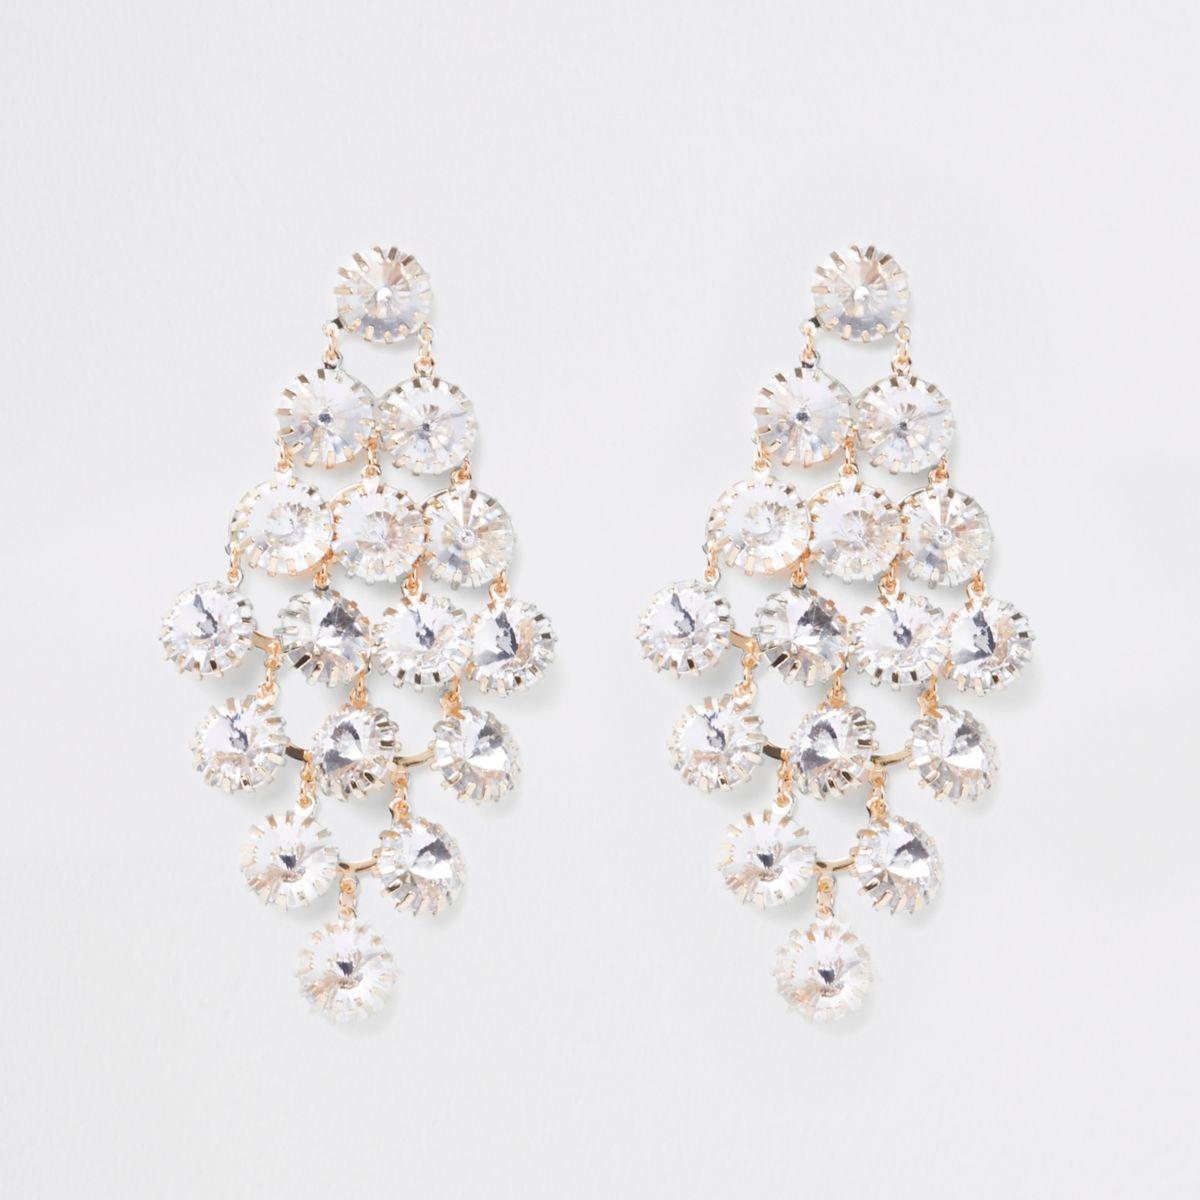 Gold tone rhinestone encrusted drop earrings